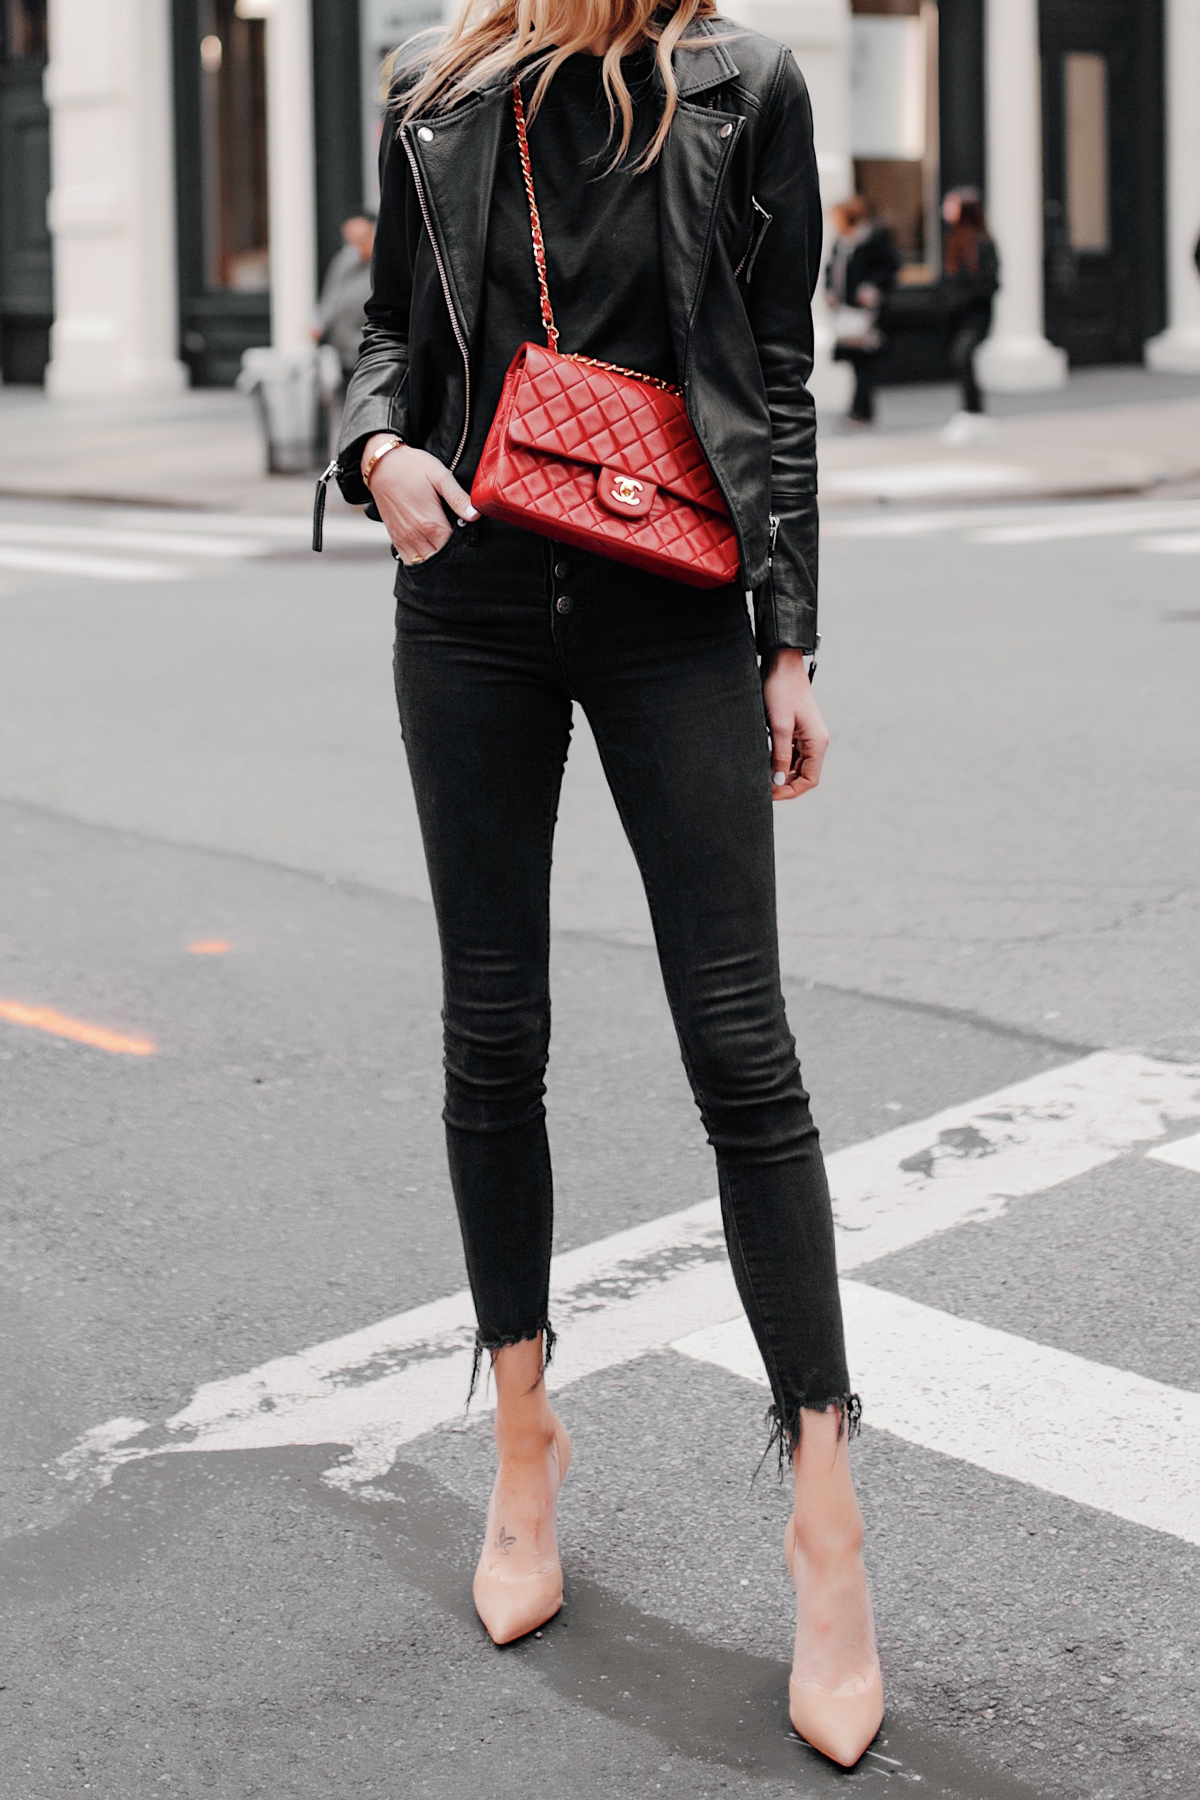 Fashion Jackson Wearing Black Leather Jacket Black Skinny Jeans Red Chanel Handbag Nude Pumps NYC Street Style 3